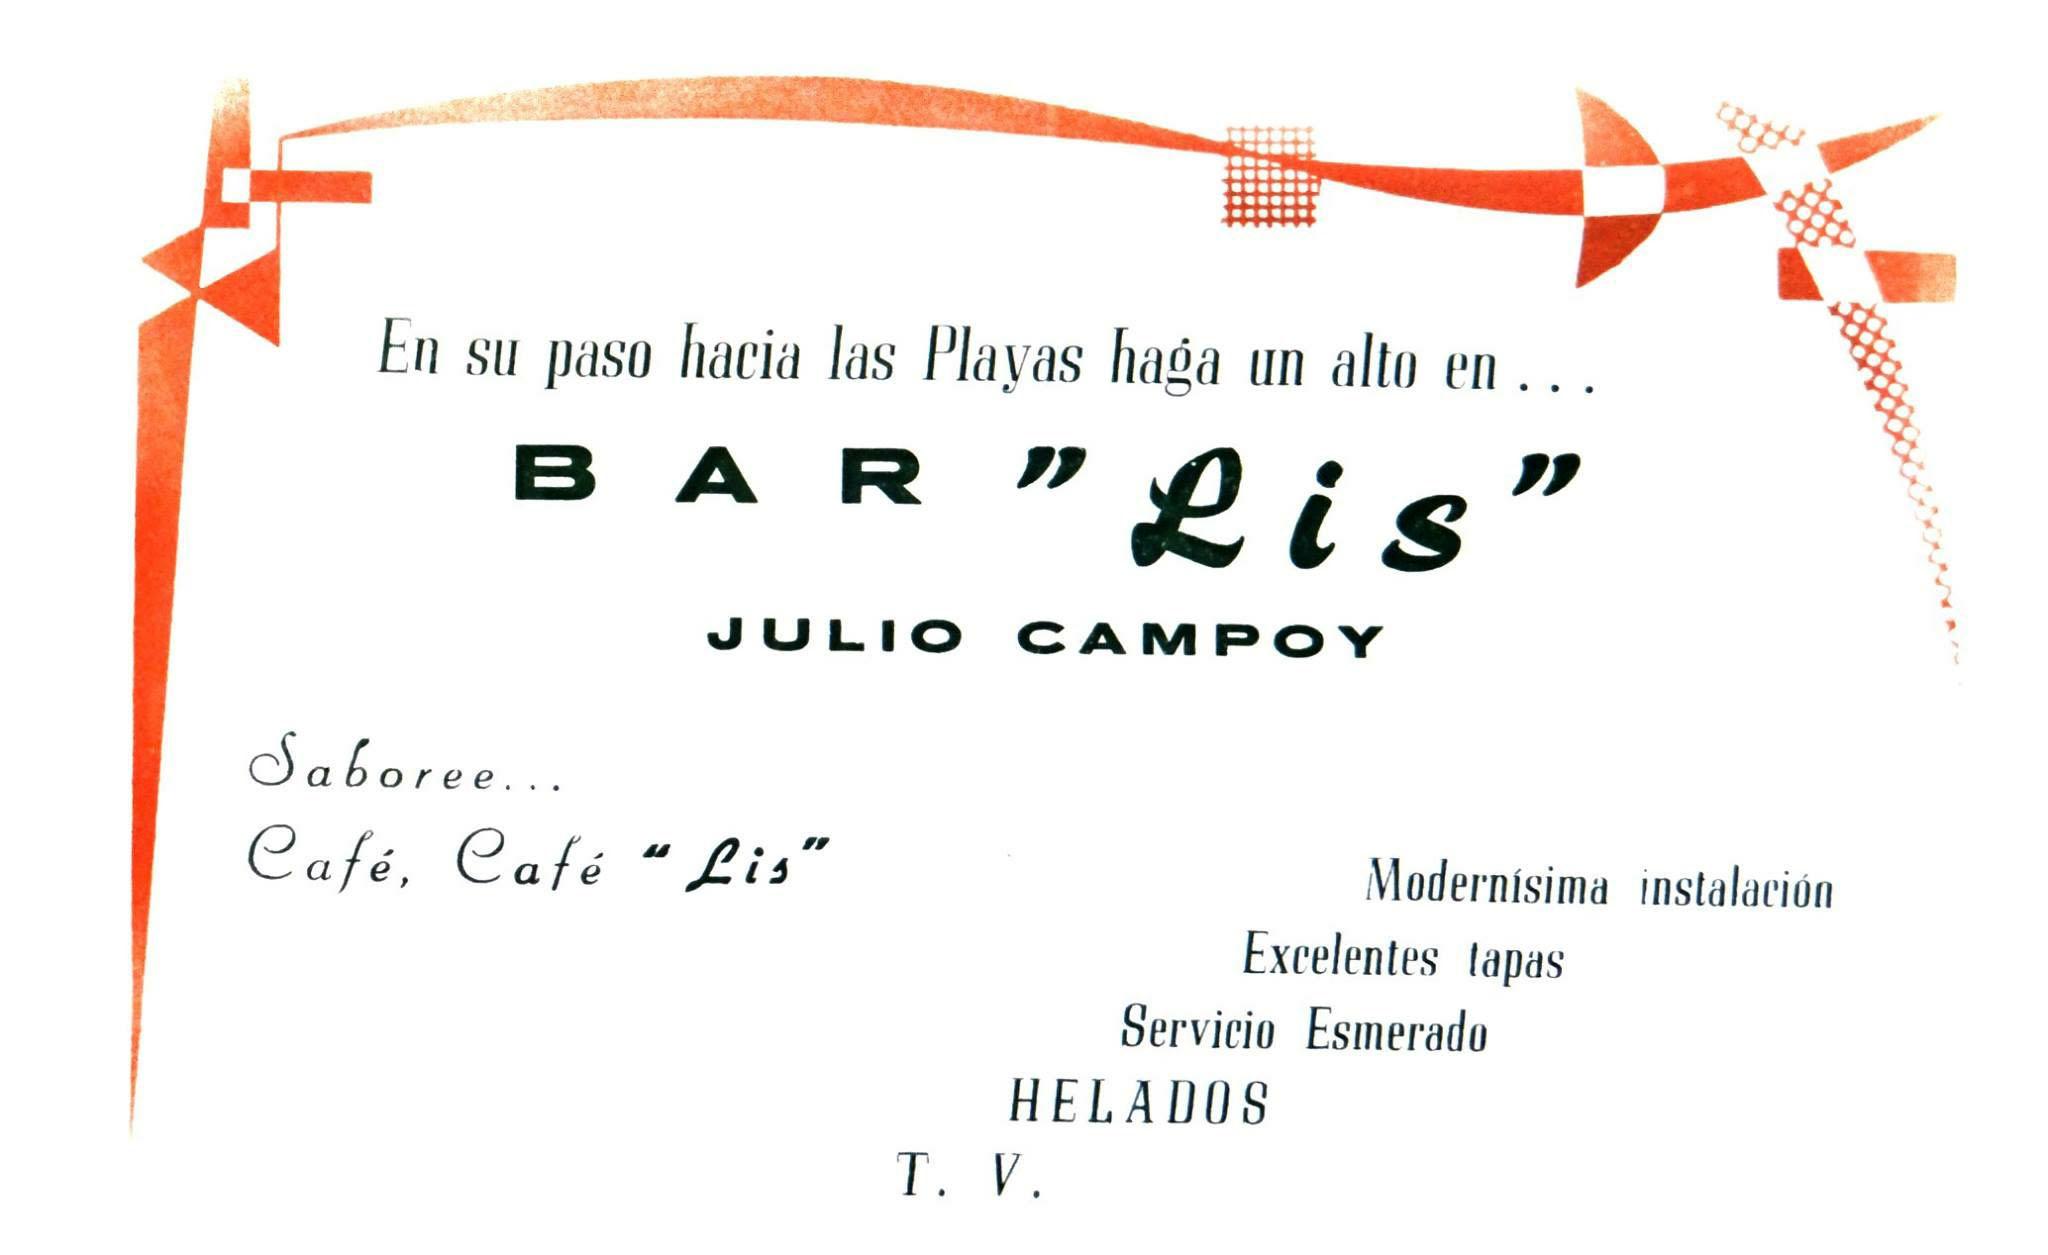 07. Bar Lis cartel